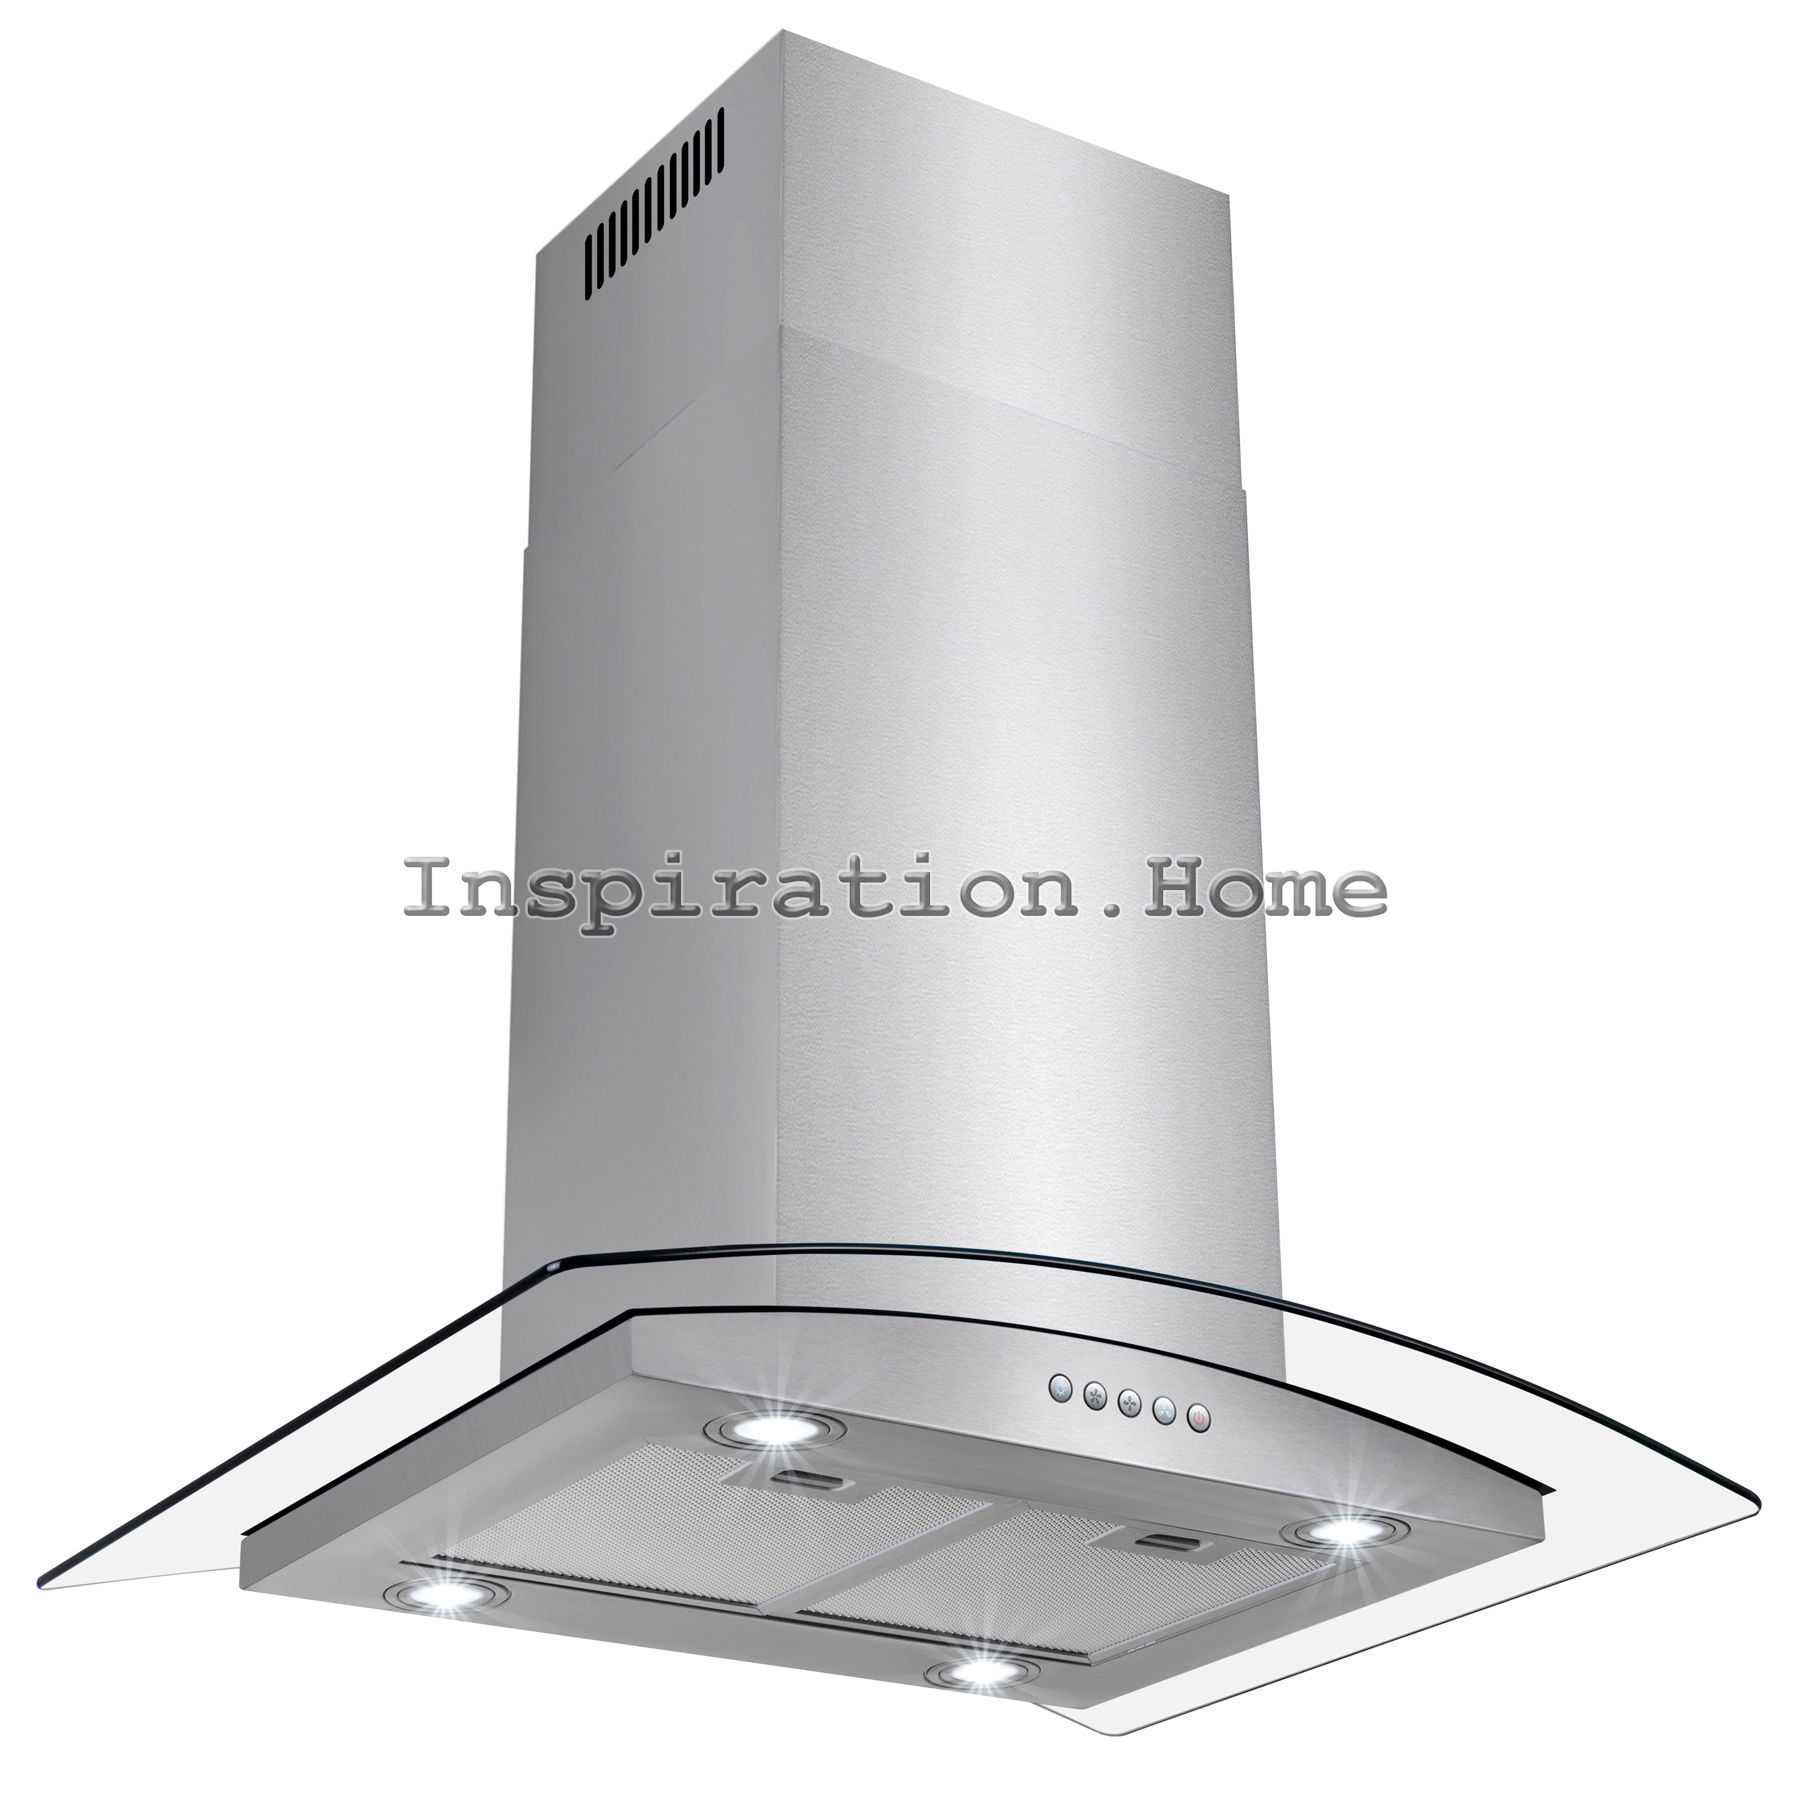 incredible ductless bathroom exhaust fan inspiration-Best Ductless Bathroom Exhaust Fan Plan